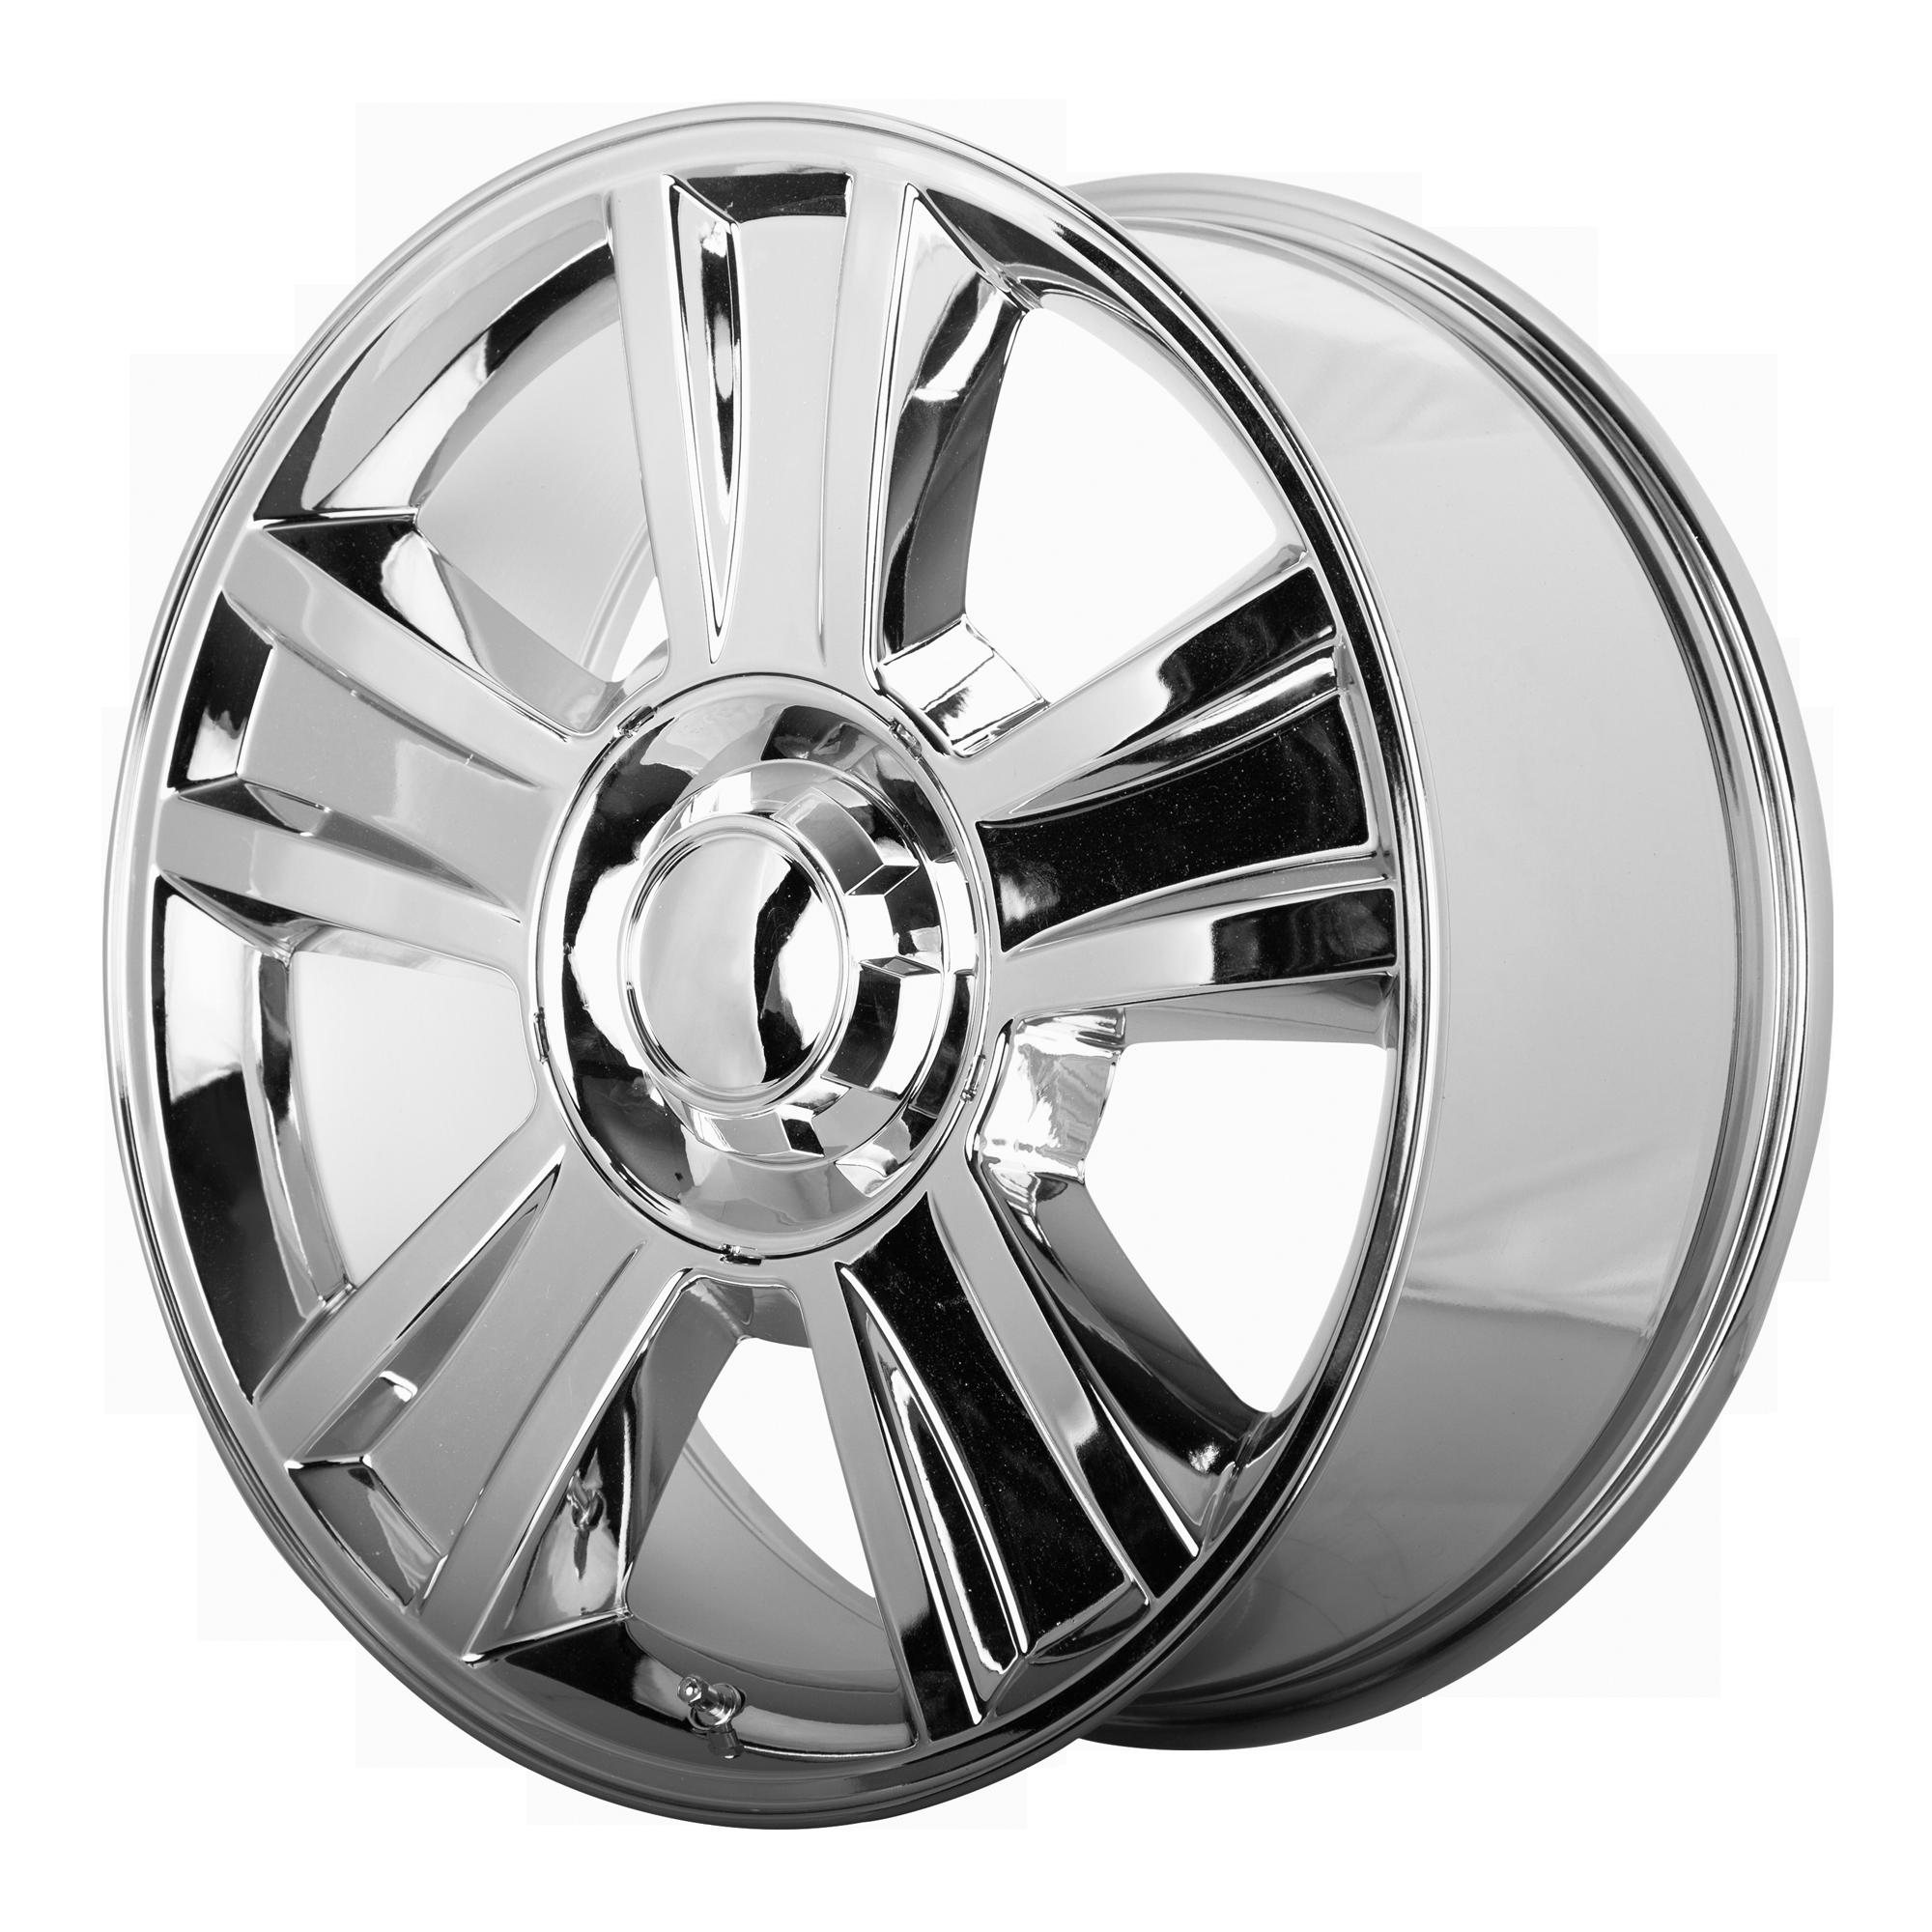 OE Creations Replica Wheels OE Creations PR143 Chrome